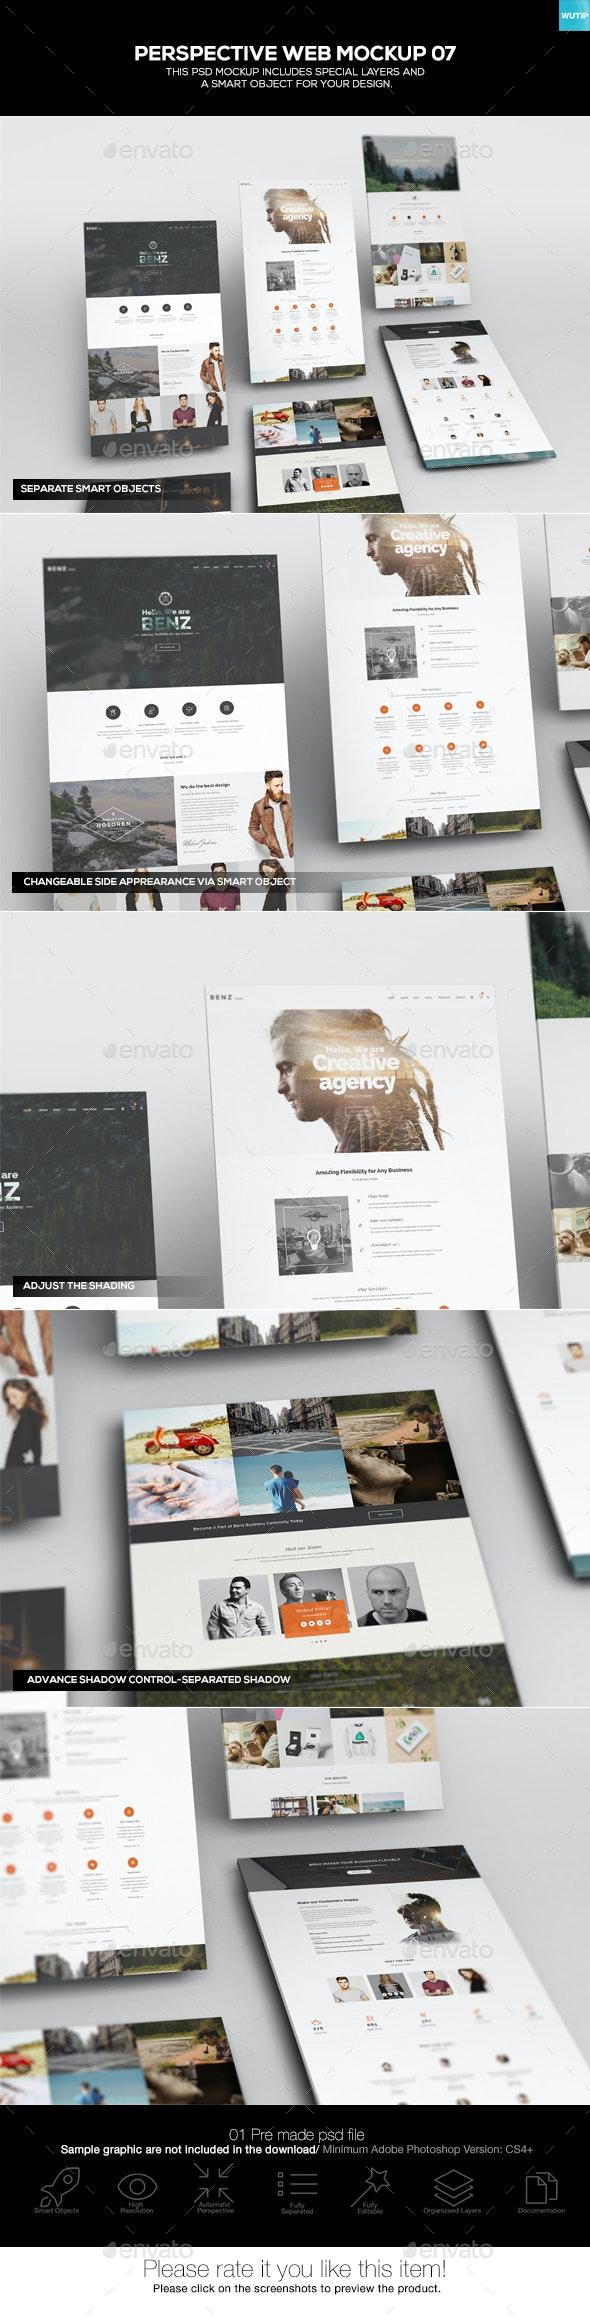 Perspective Web Mockup 07 - Website Displays